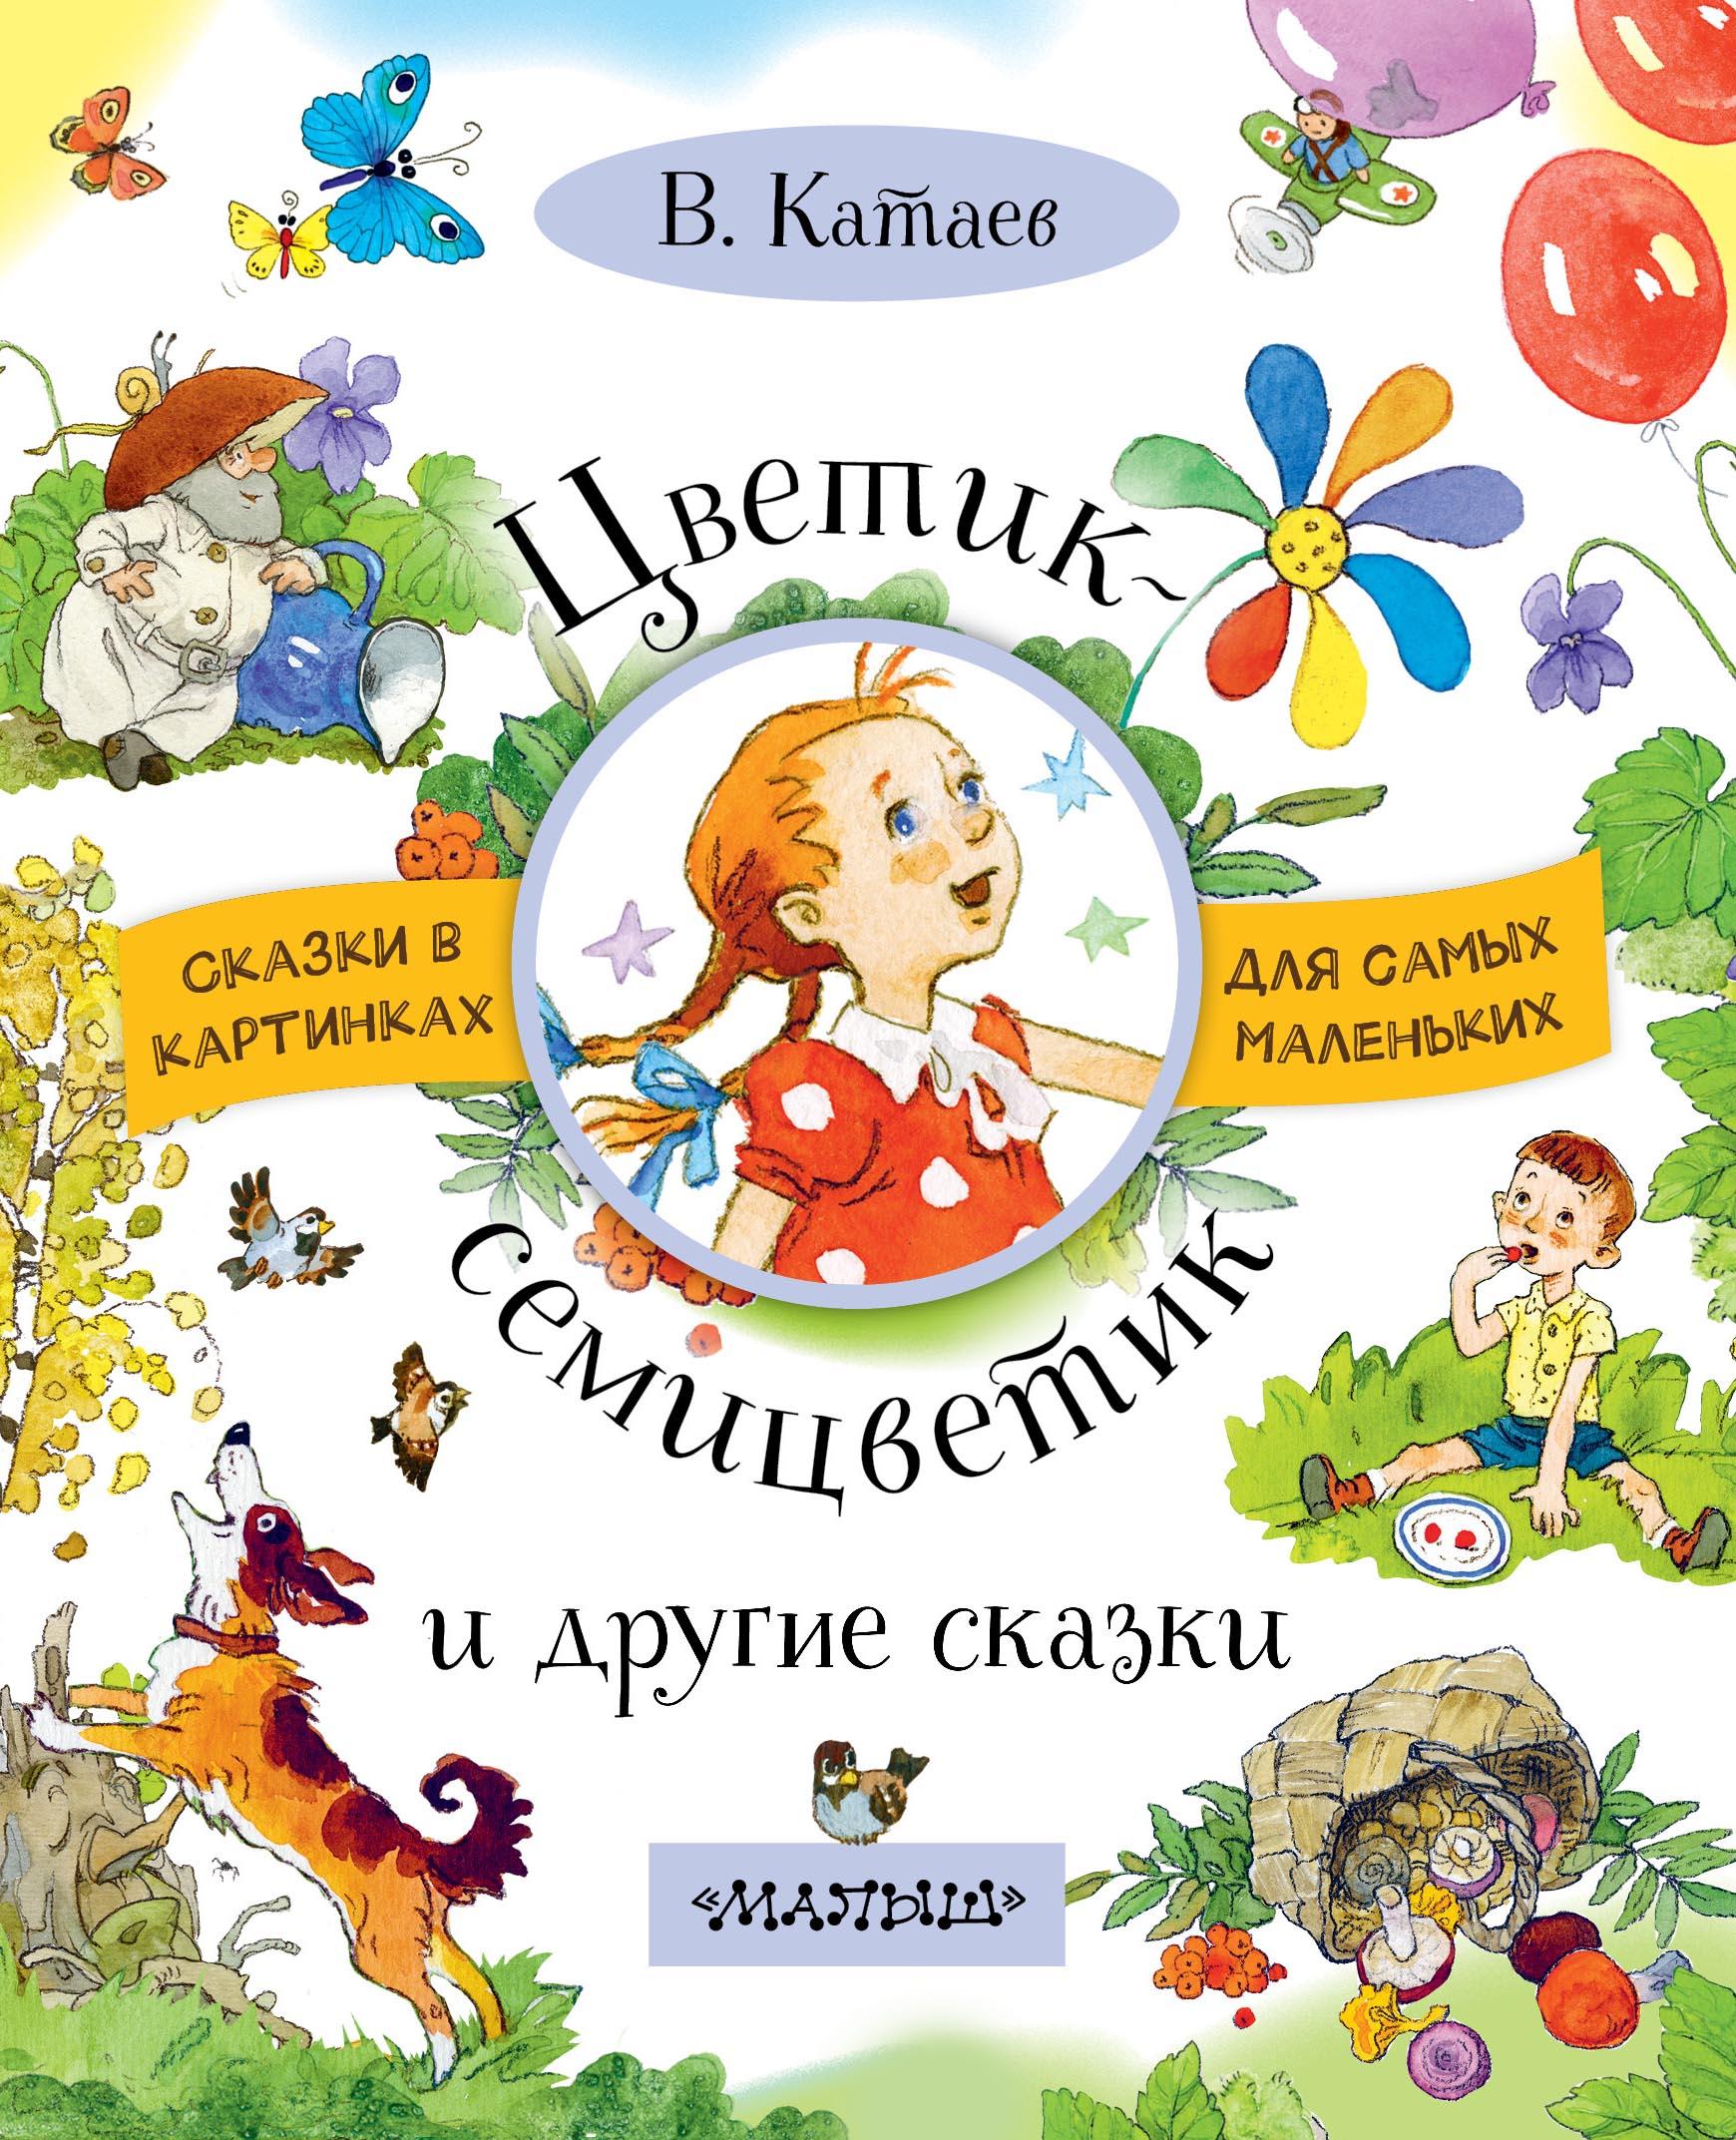 Катаев В.П. Цветик-семицветик и другие сказки катаев валентин петрович дудочка и кувшинчик